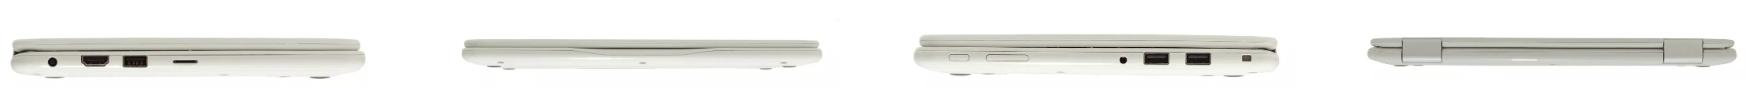 Dell 戴尔 Inspiron 11 3179 评测